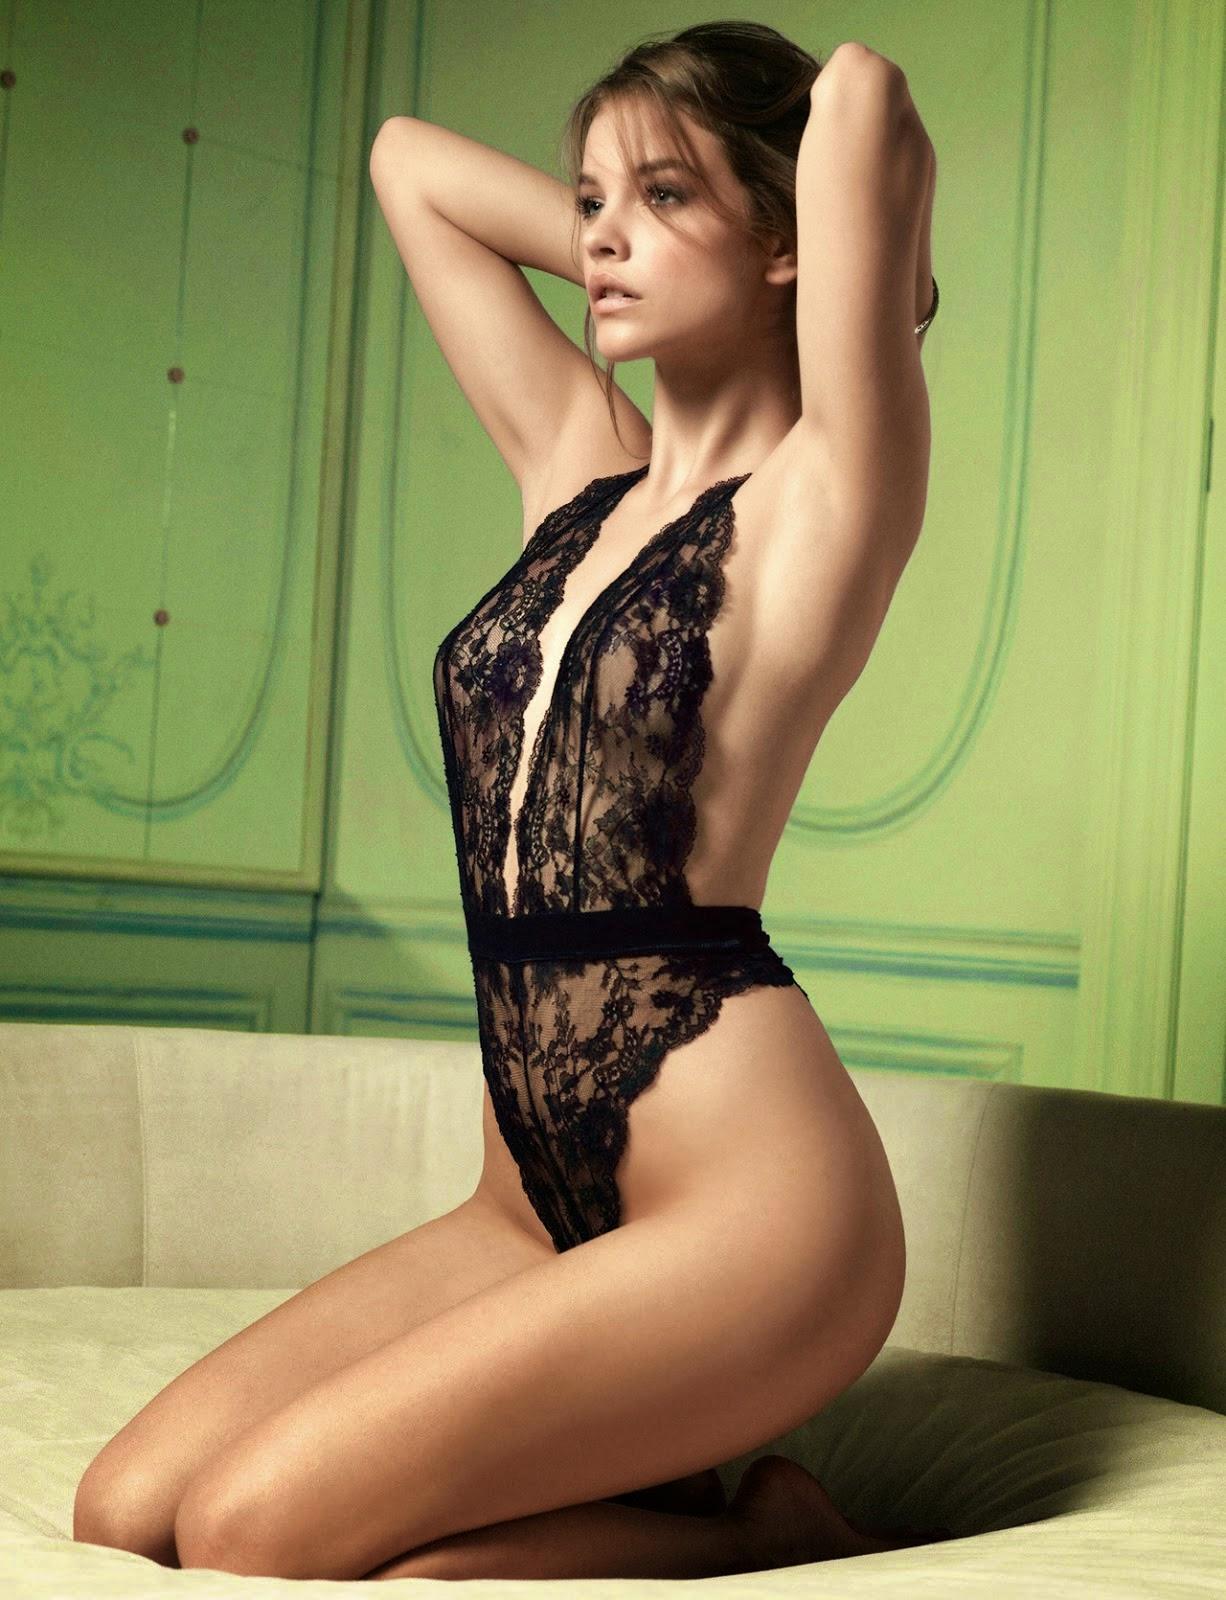 Barbara Palvin once again for the spring-summer 2014 Beachwear campaign. Barbara Palvin twin set bikini 2014.